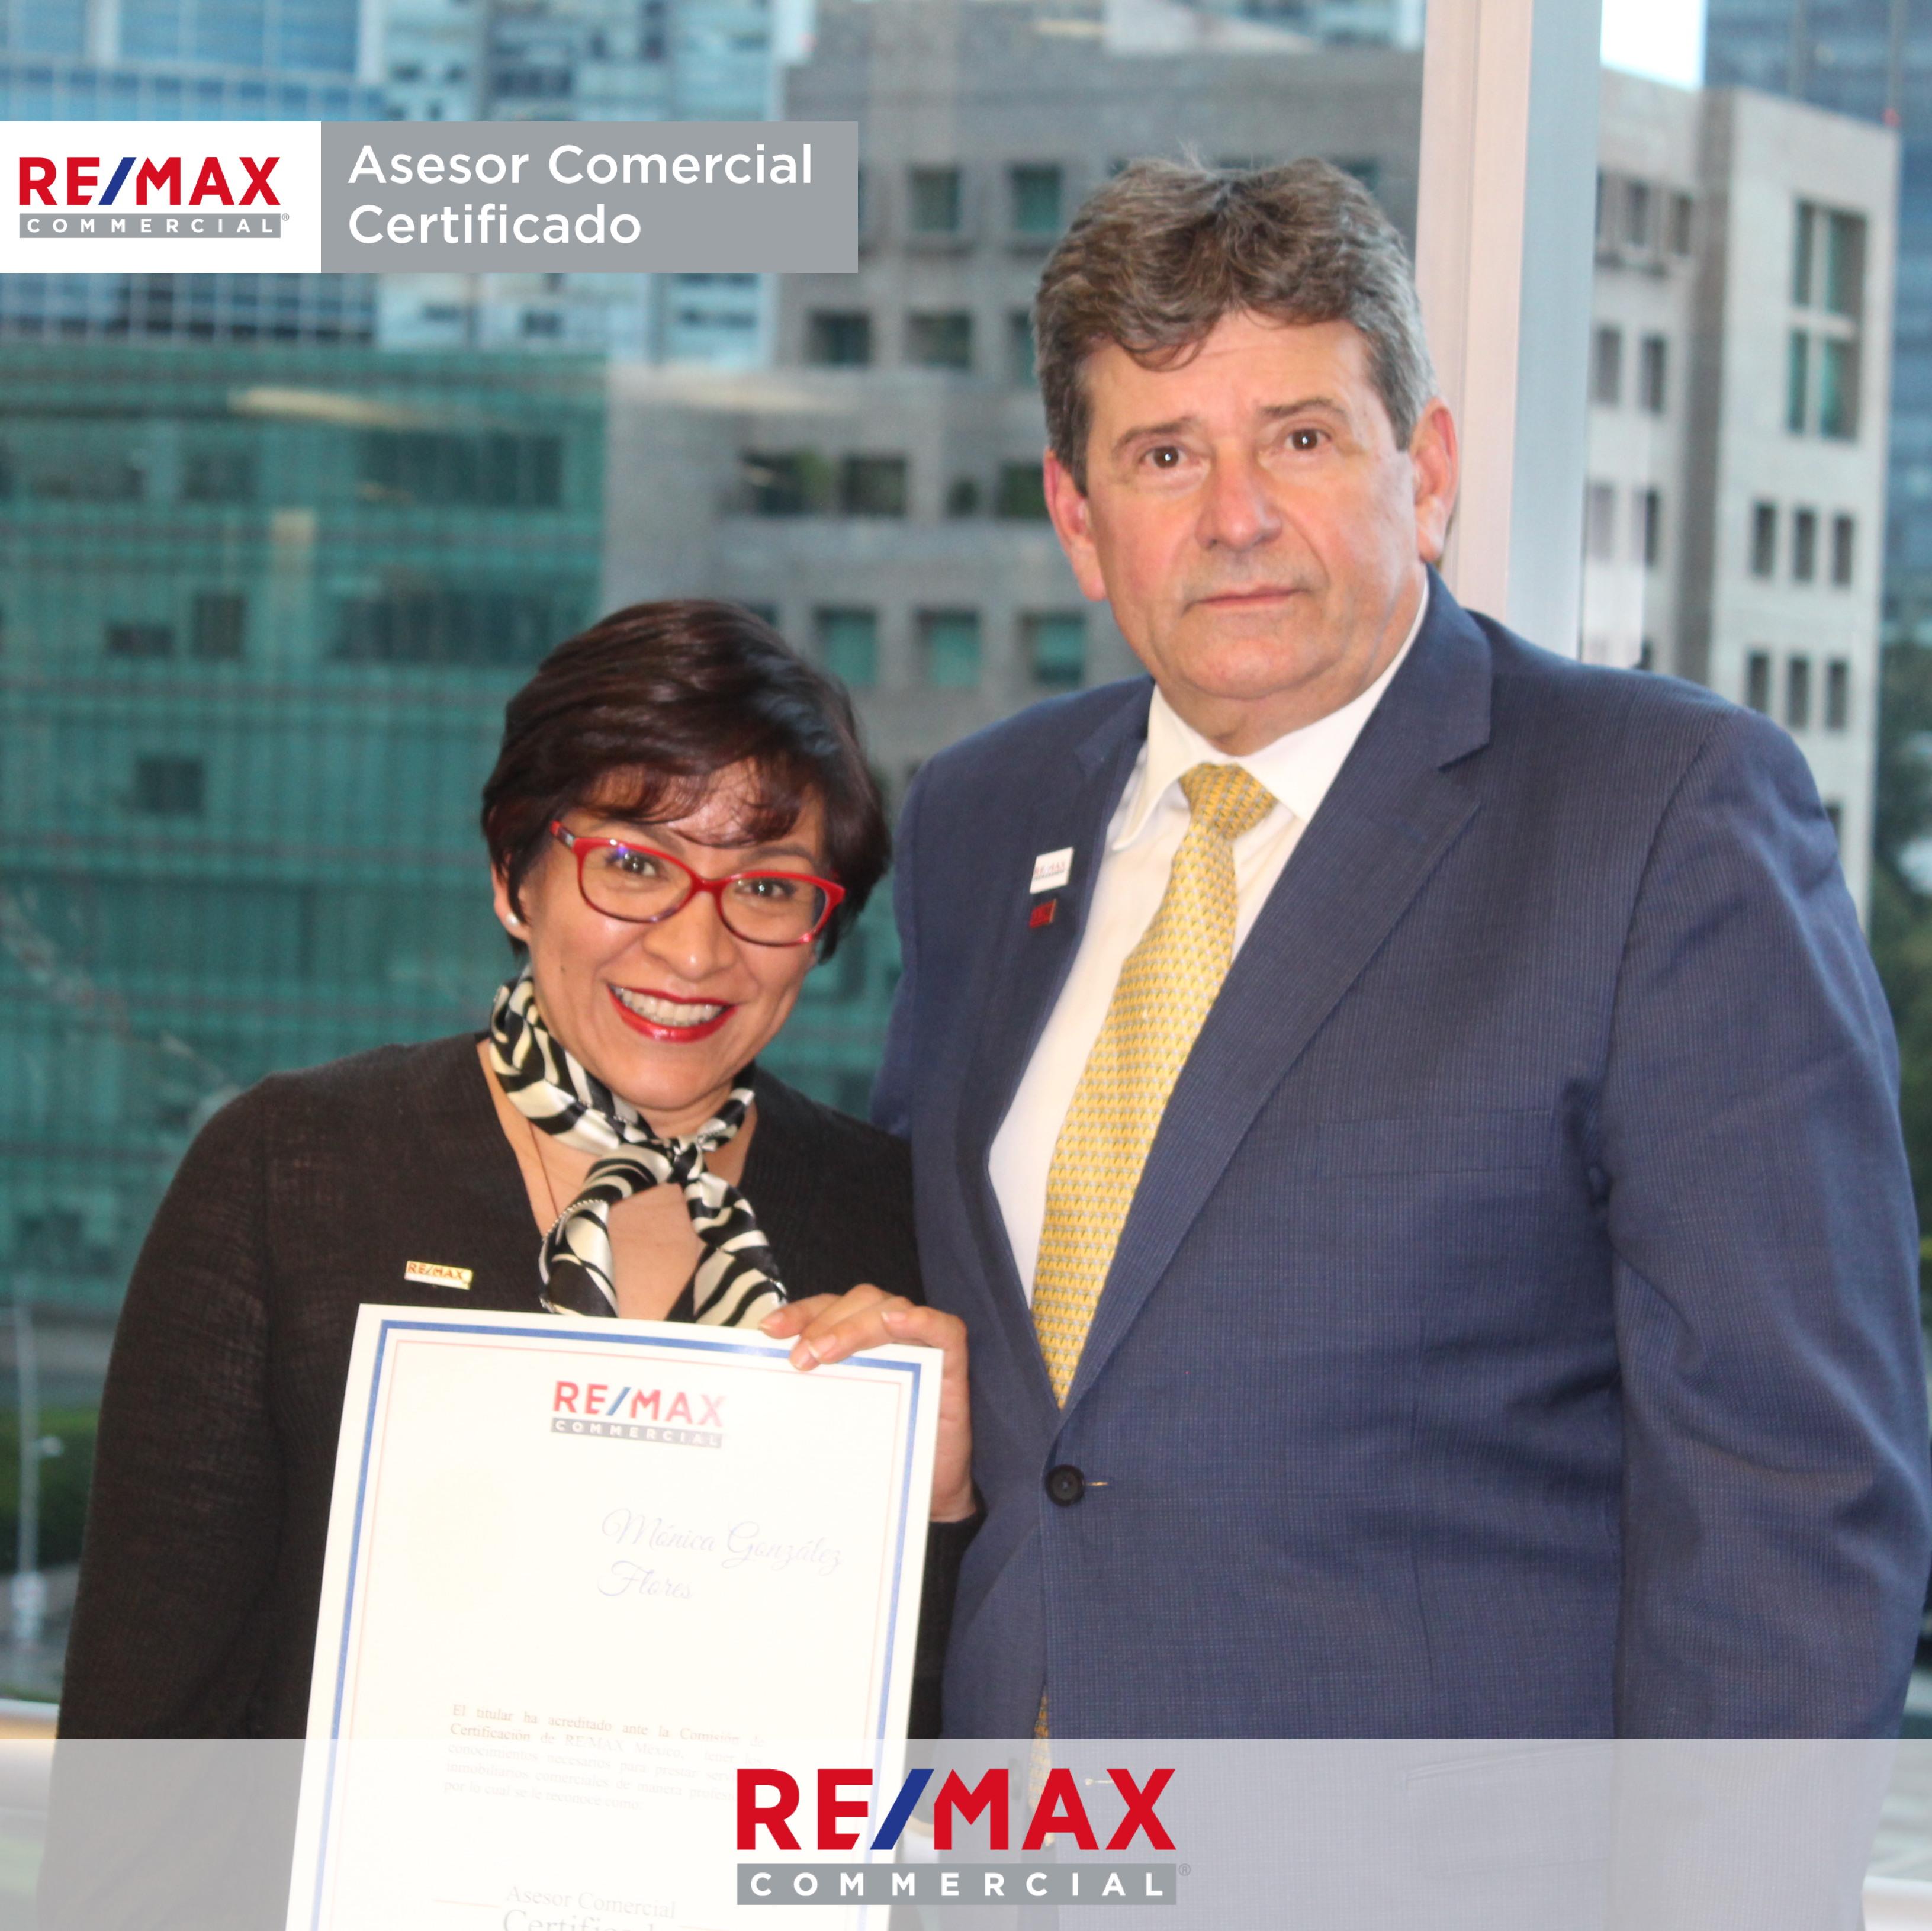 14_Certificacion_comercial_comprar_rentar_vender_casa_departamento_franquicias_inmobiliarias_REMAX_mexico_propiedades_comerciales_terrenos_bodegas